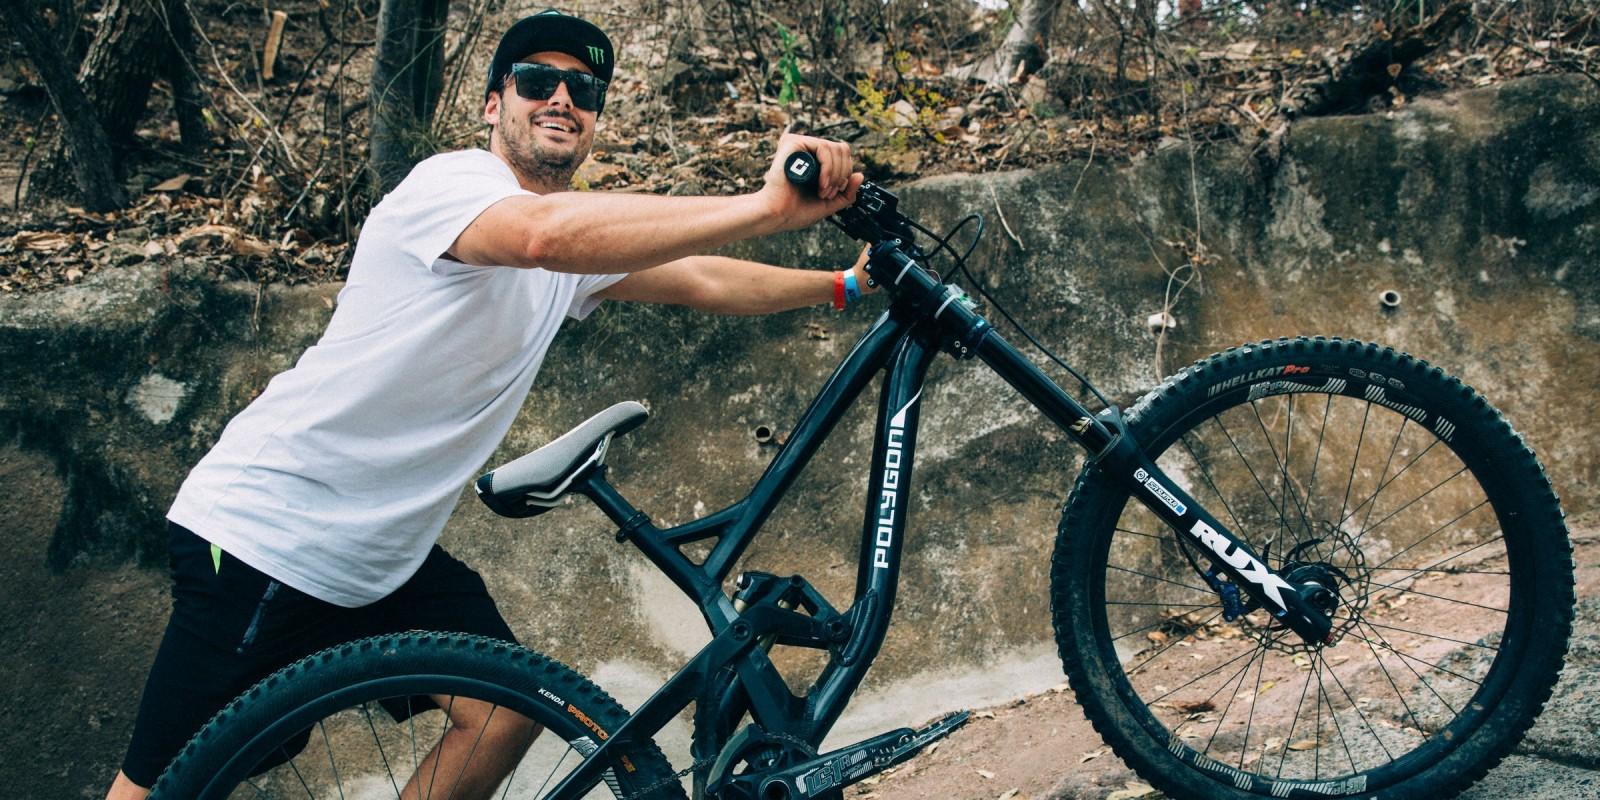 Down Puerto Vallarta, Downhill, Mountain Bike, Mountain Biking, Urban Downhill, Mexico, Sam Reynolds